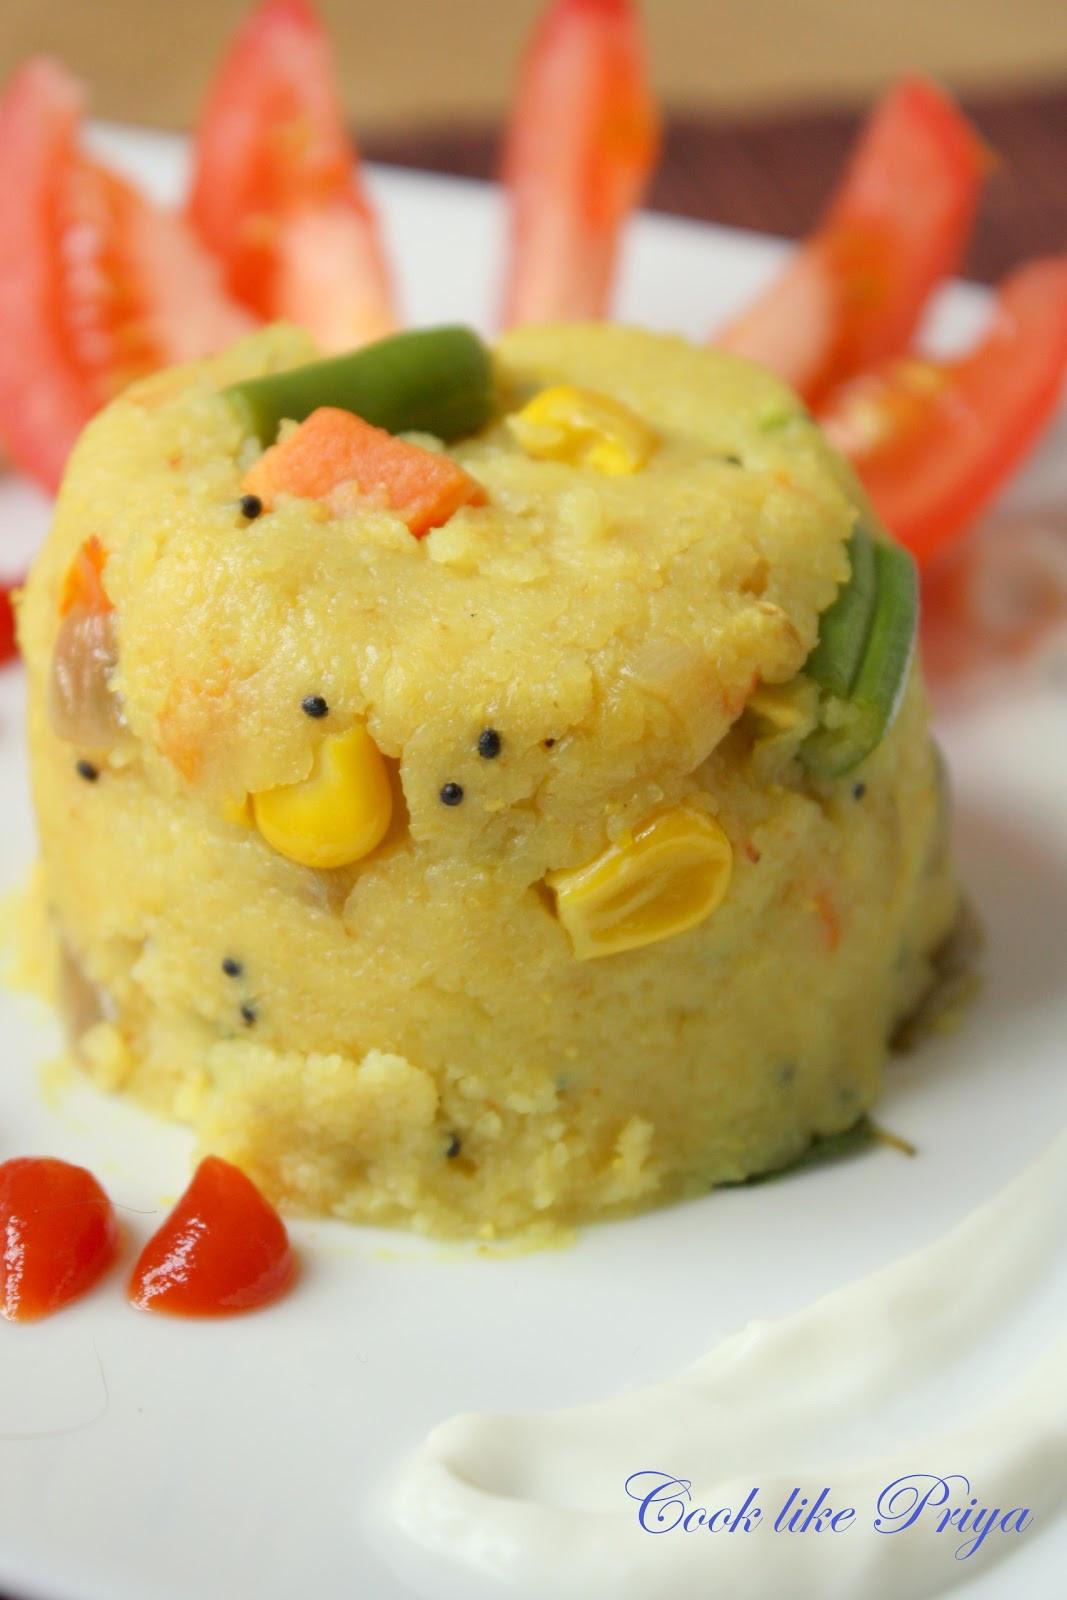 Indian Brunch Recipes  Cook like Priya Mixed Veg Kichadi Simple South Indian